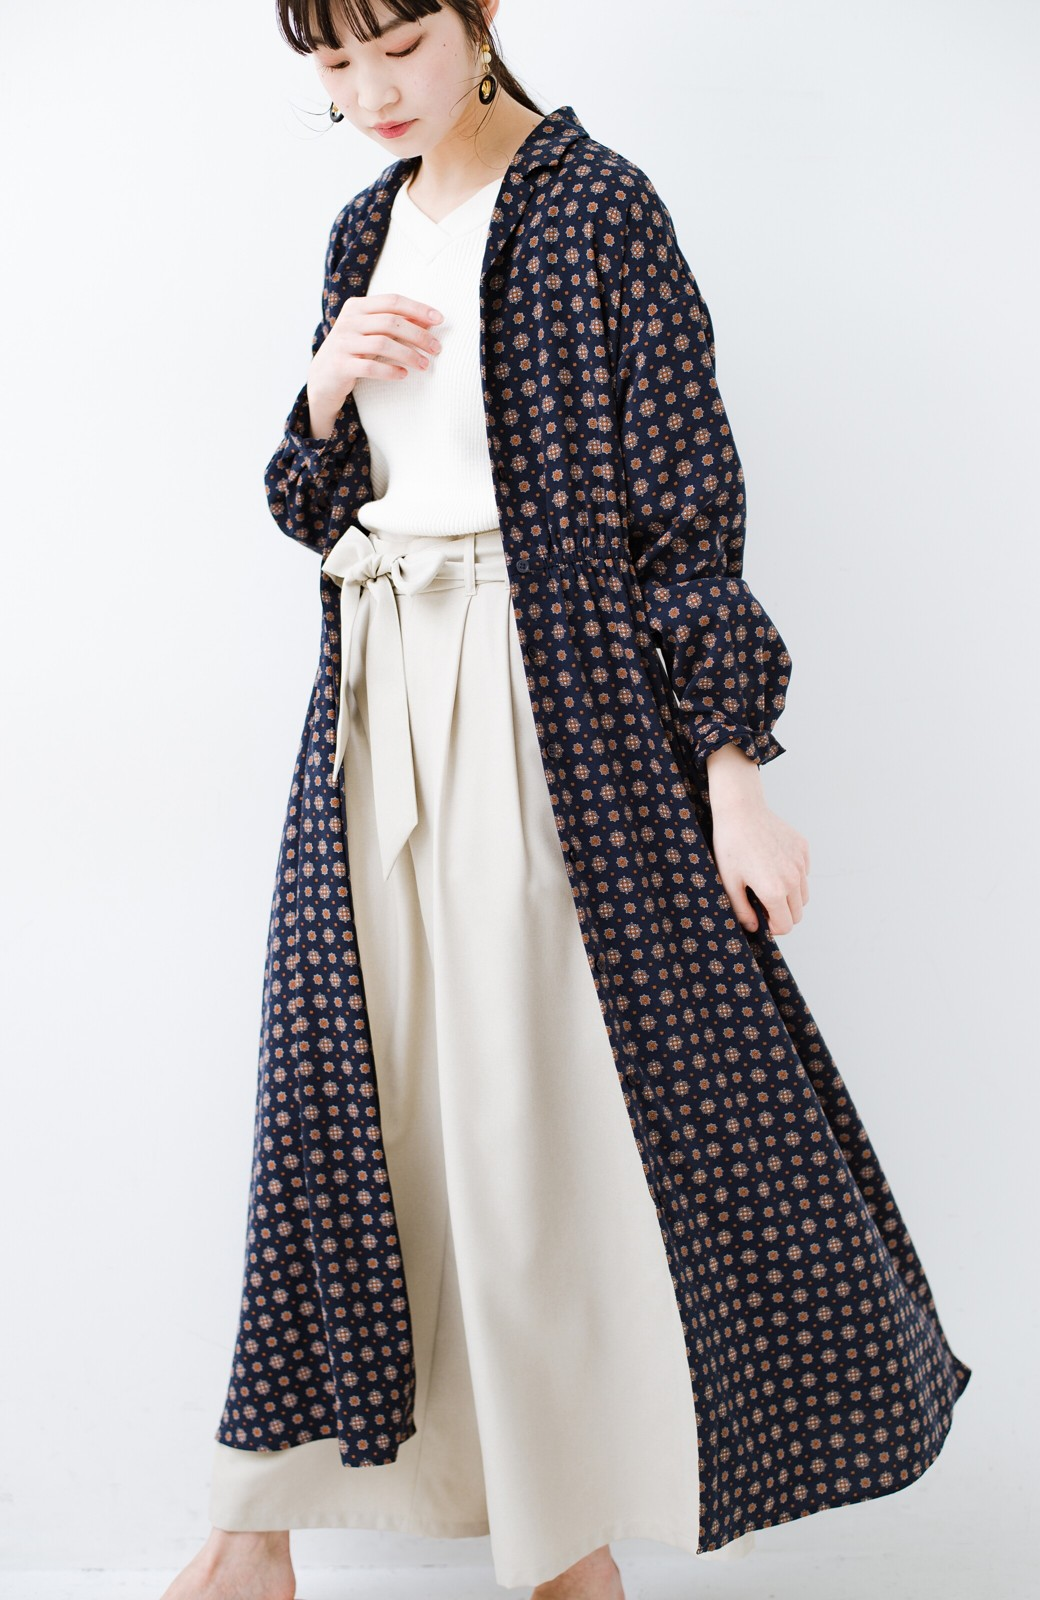 haco! 1枚でも羽織としても着られて便利! 長ーーく使えて着映えする柄ワンピース <ネイビー>の商品写真6